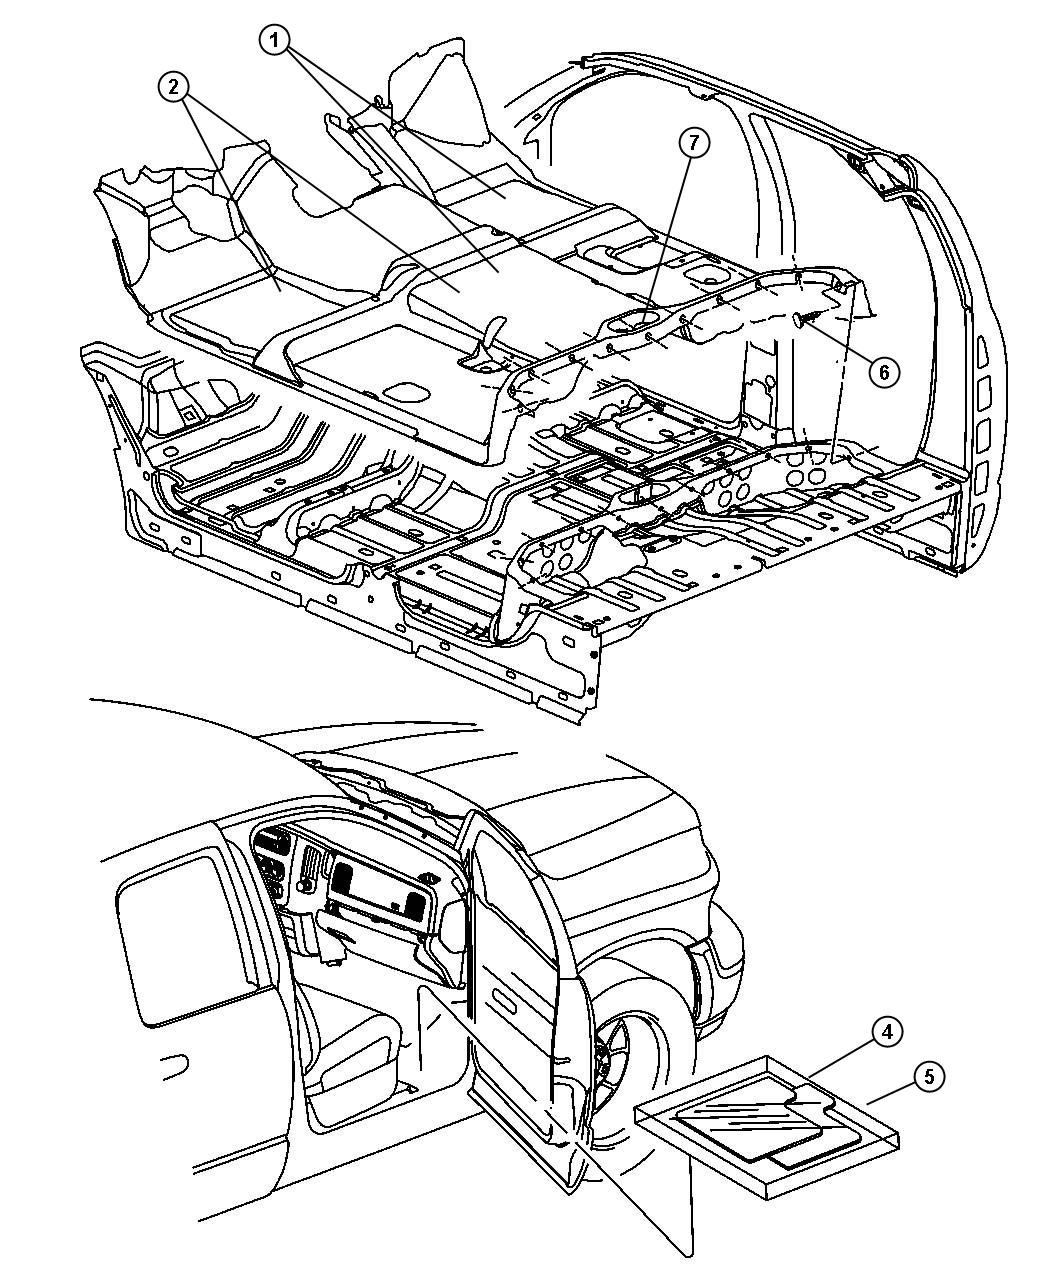 RAM 3500 Mat kit. Floor. [kt], [kt], [front floor mats